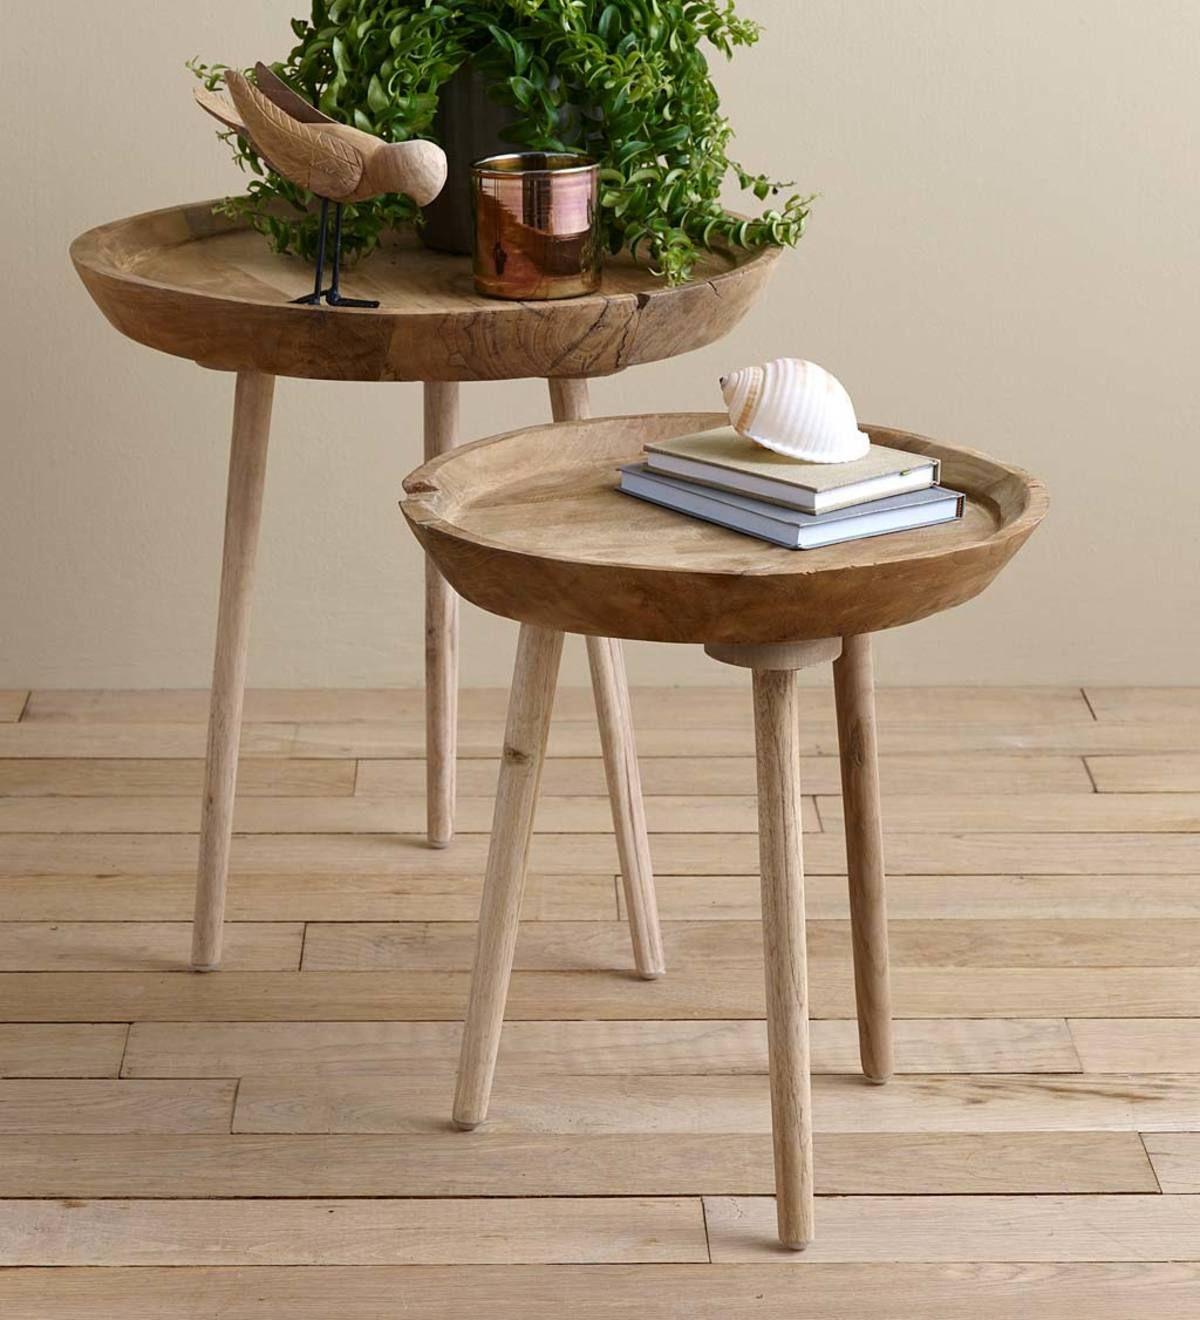 Takara Short Side Table Vivaterra Minimalist Side Table Side Table Decor Round Side Table [ 1320 x 1200 Pixel ]